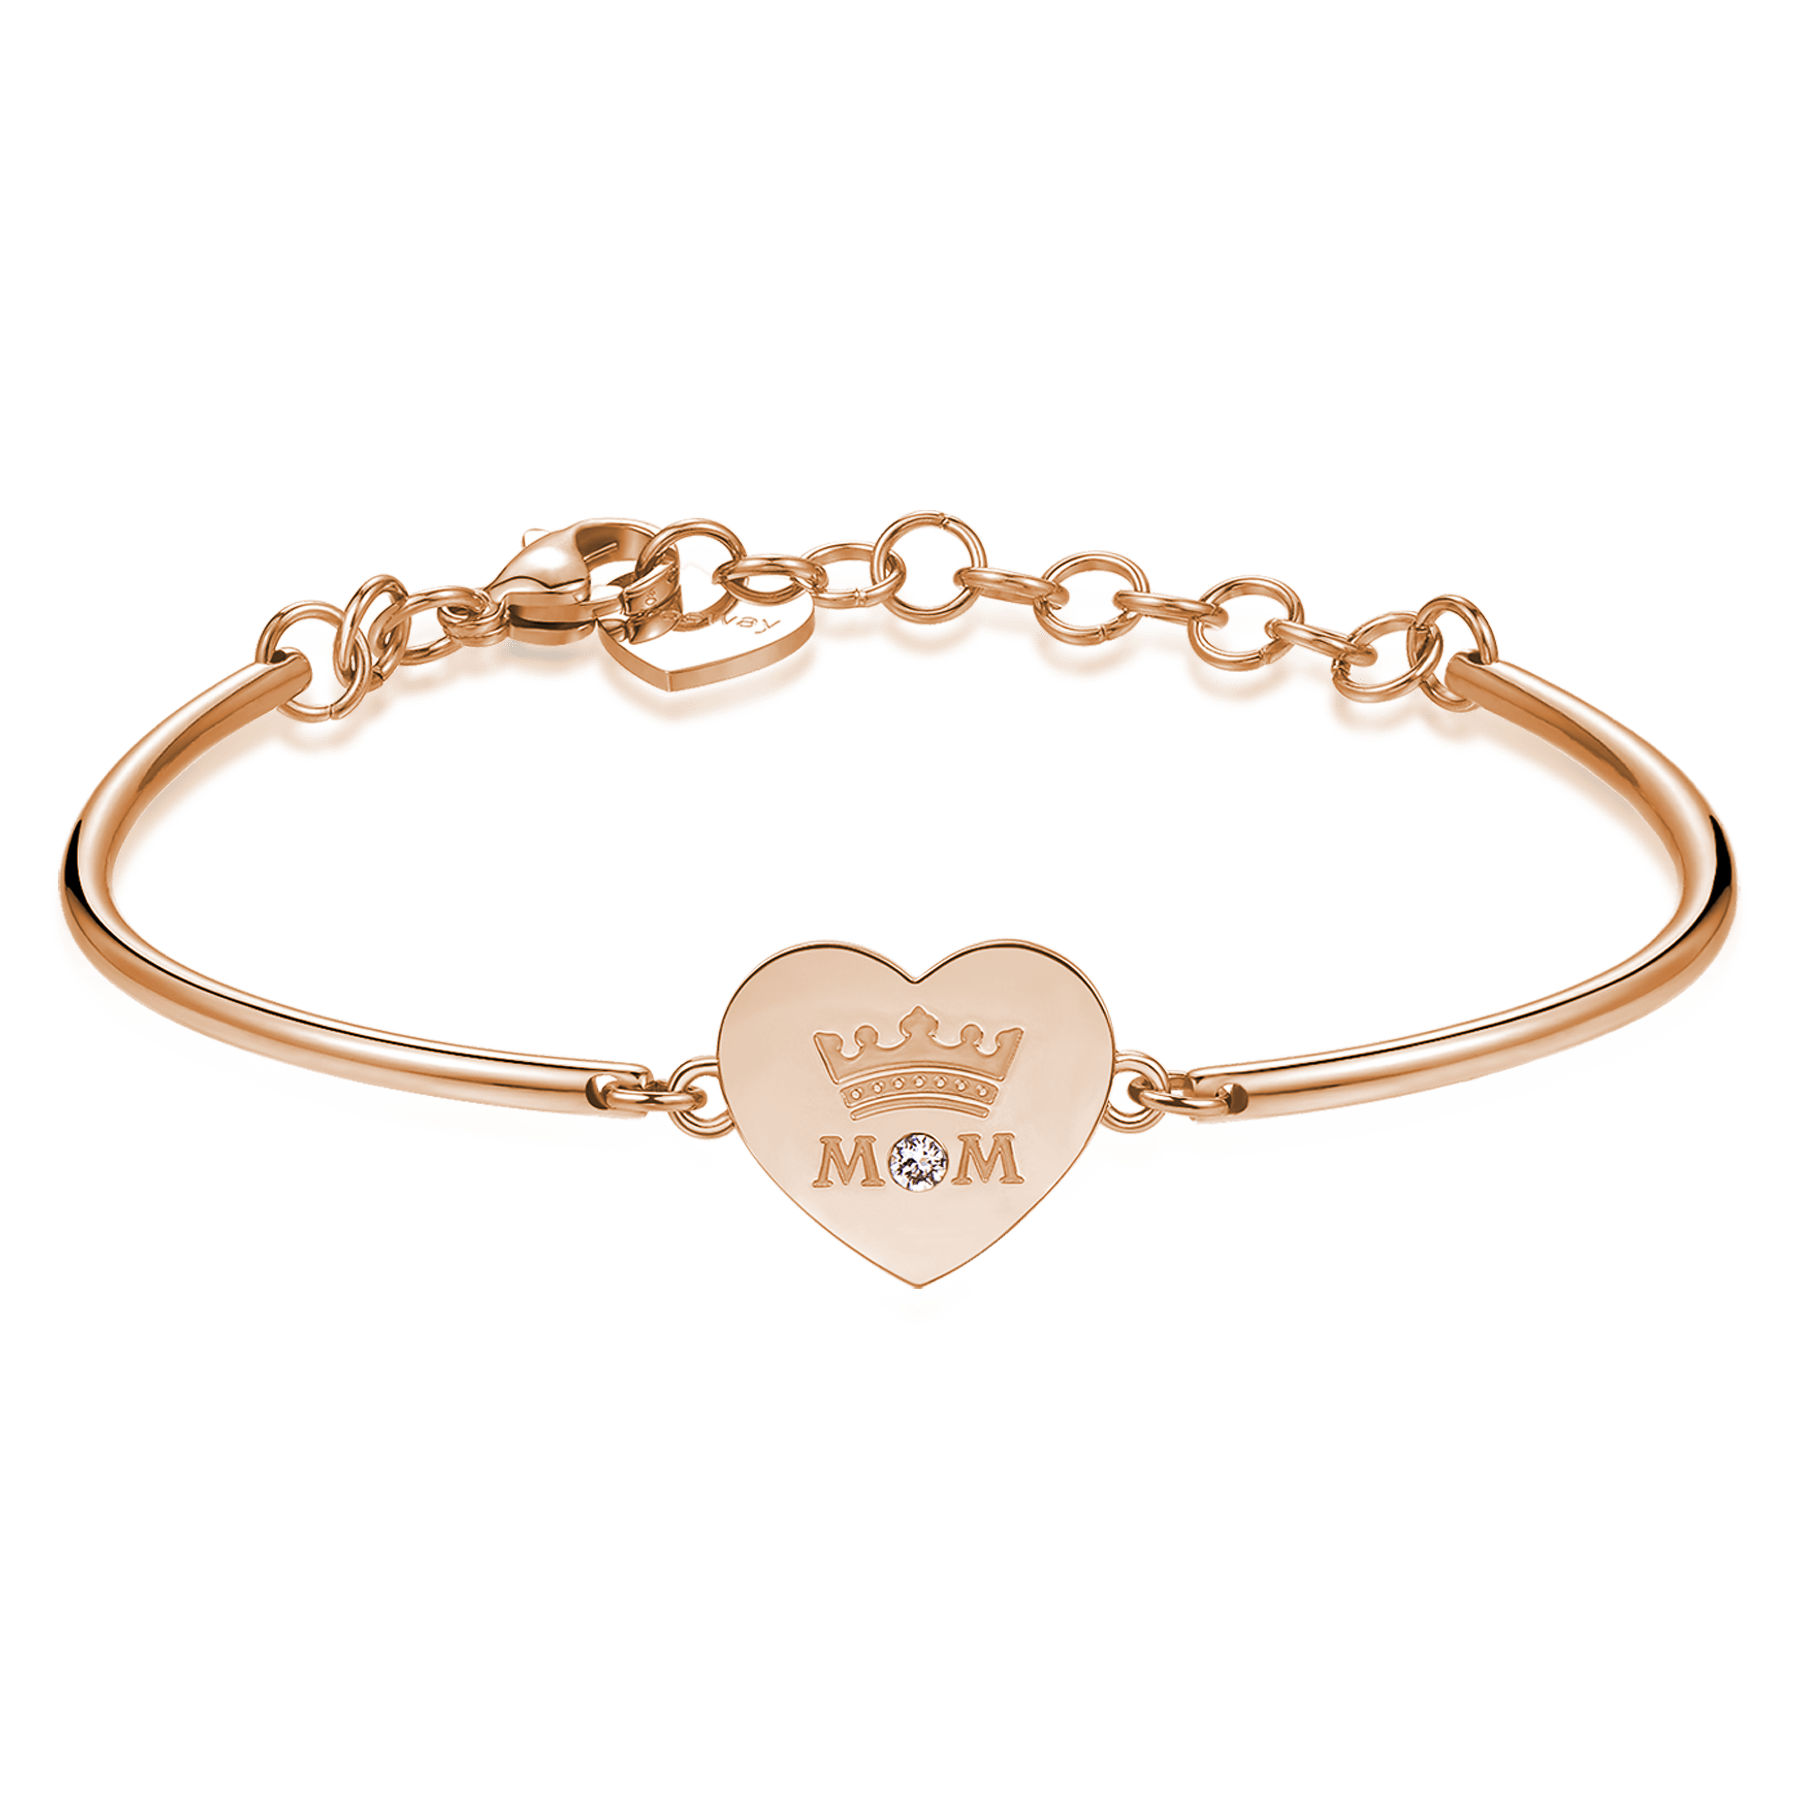 chakra bracelet with mom engrave